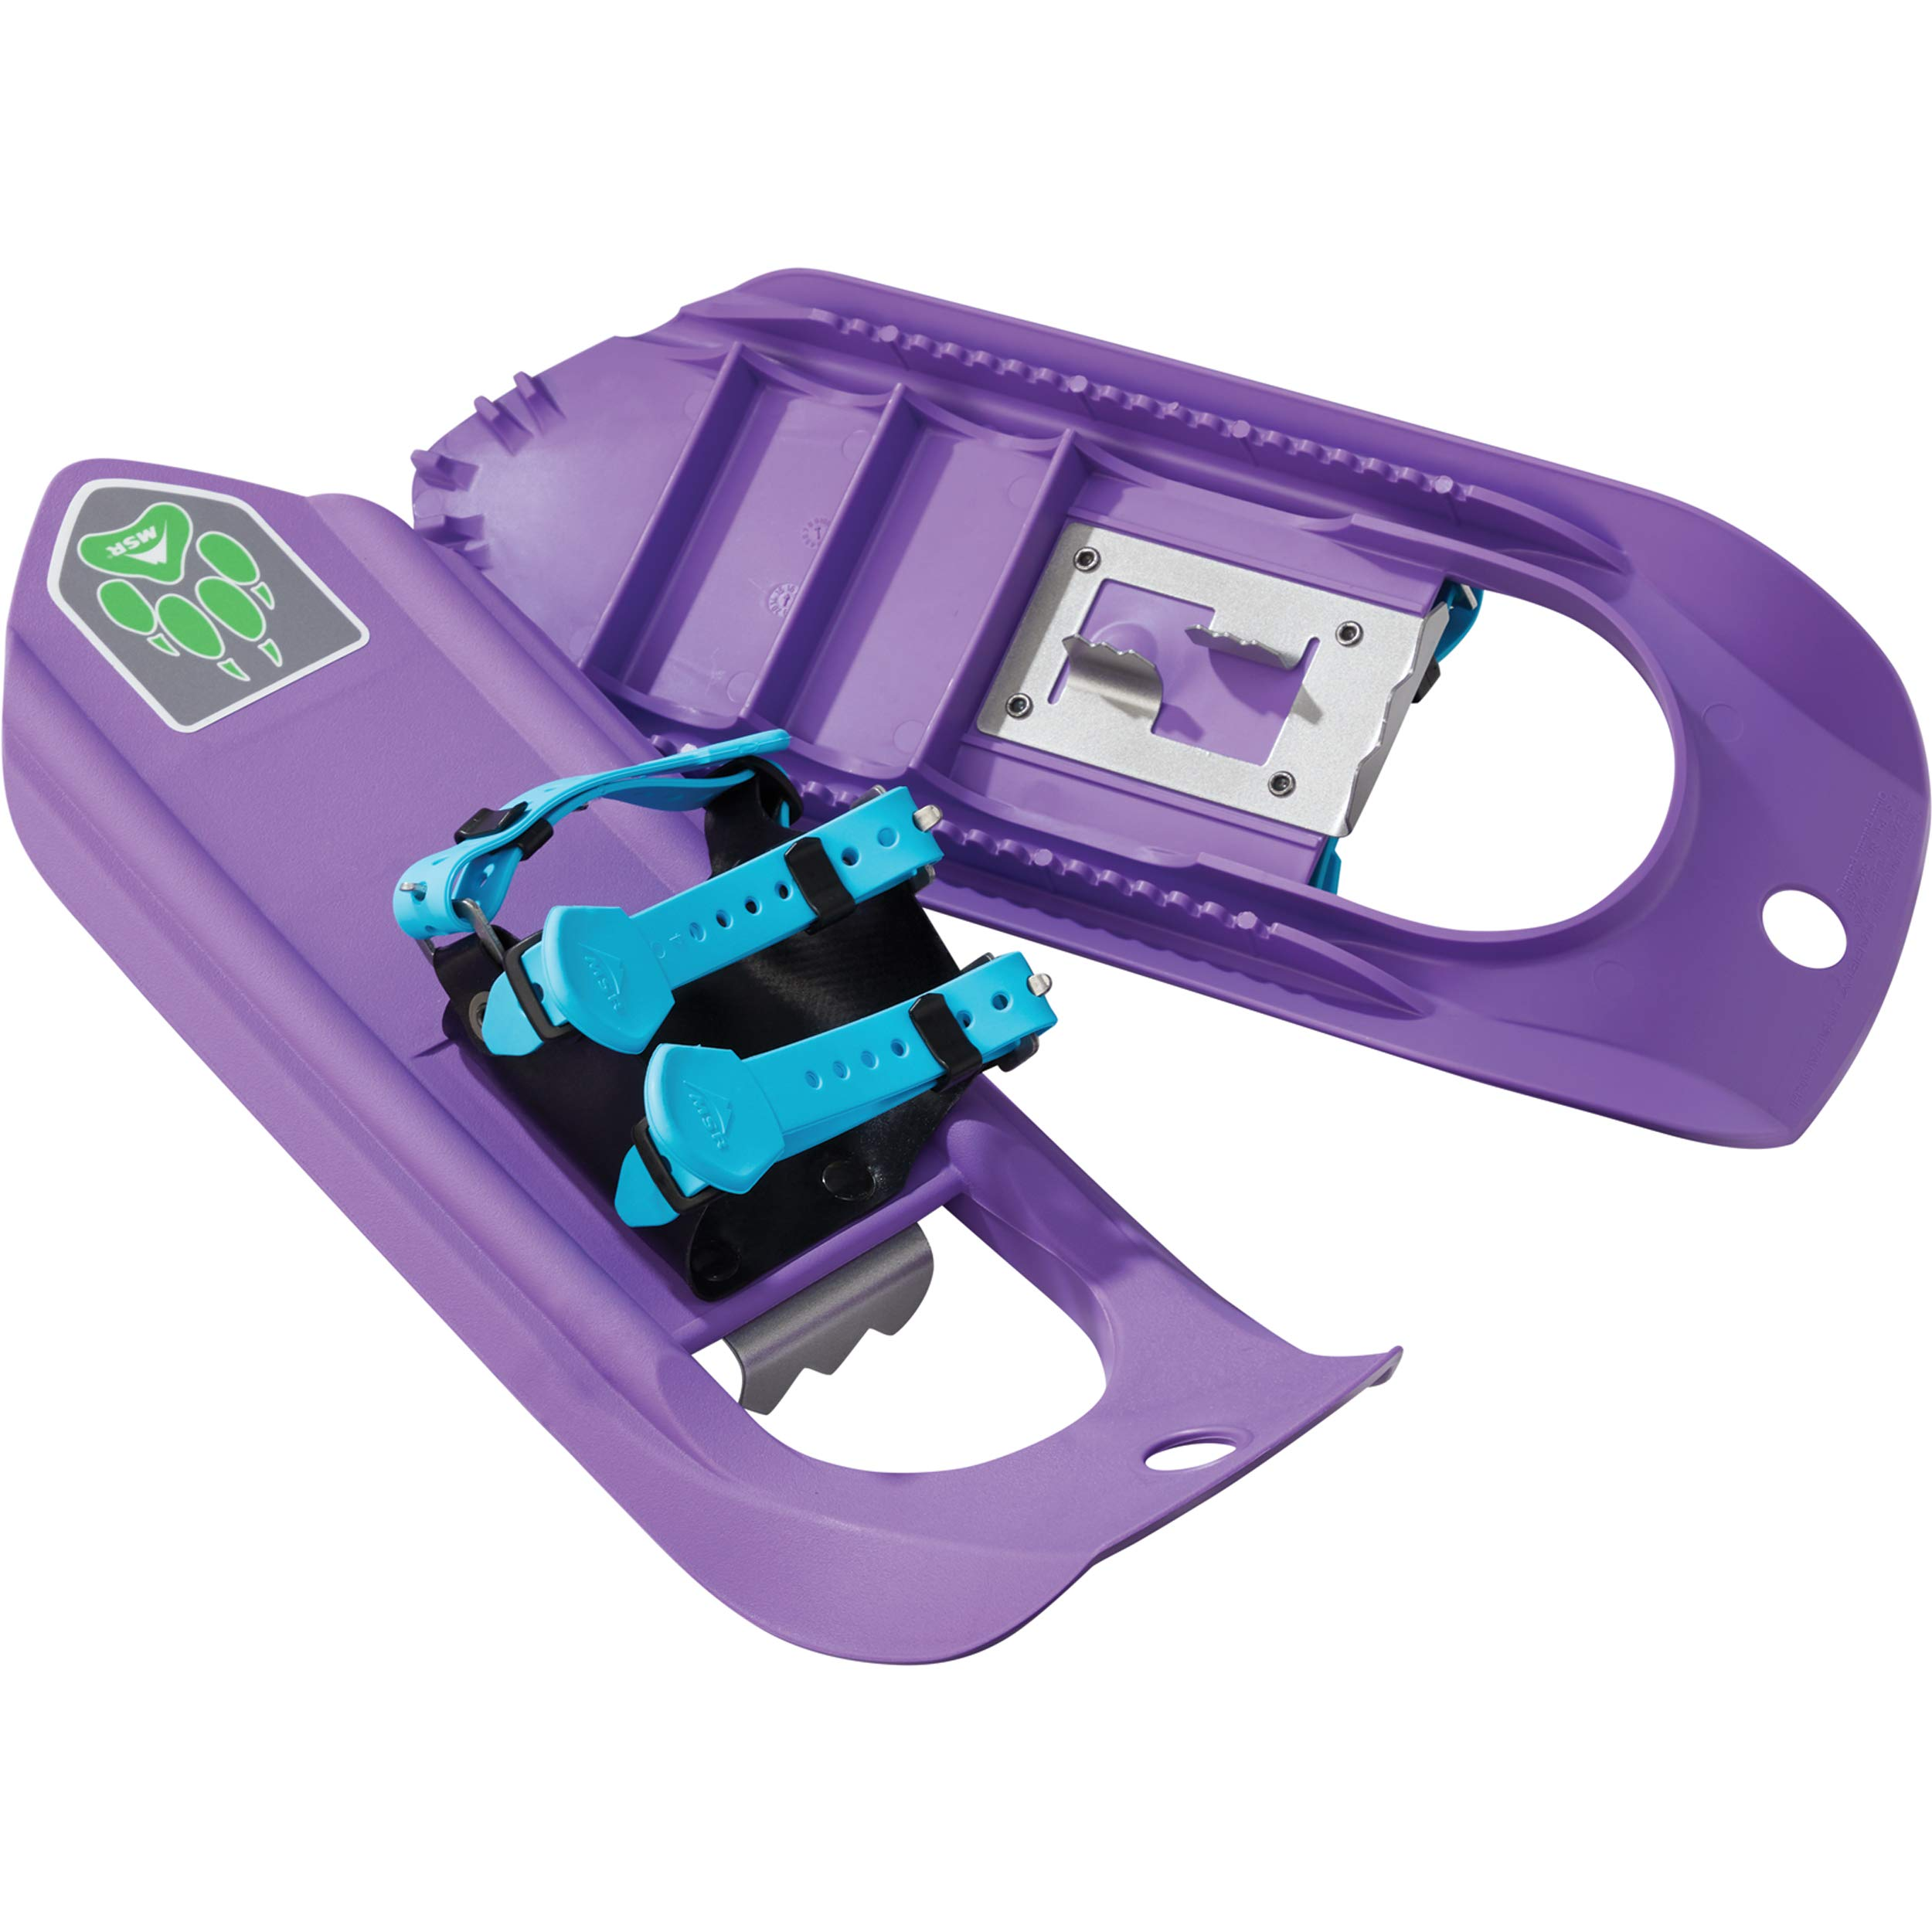 MSR Tyker Kids' Snowshoes for Children (Pair), Purple Power by MSR